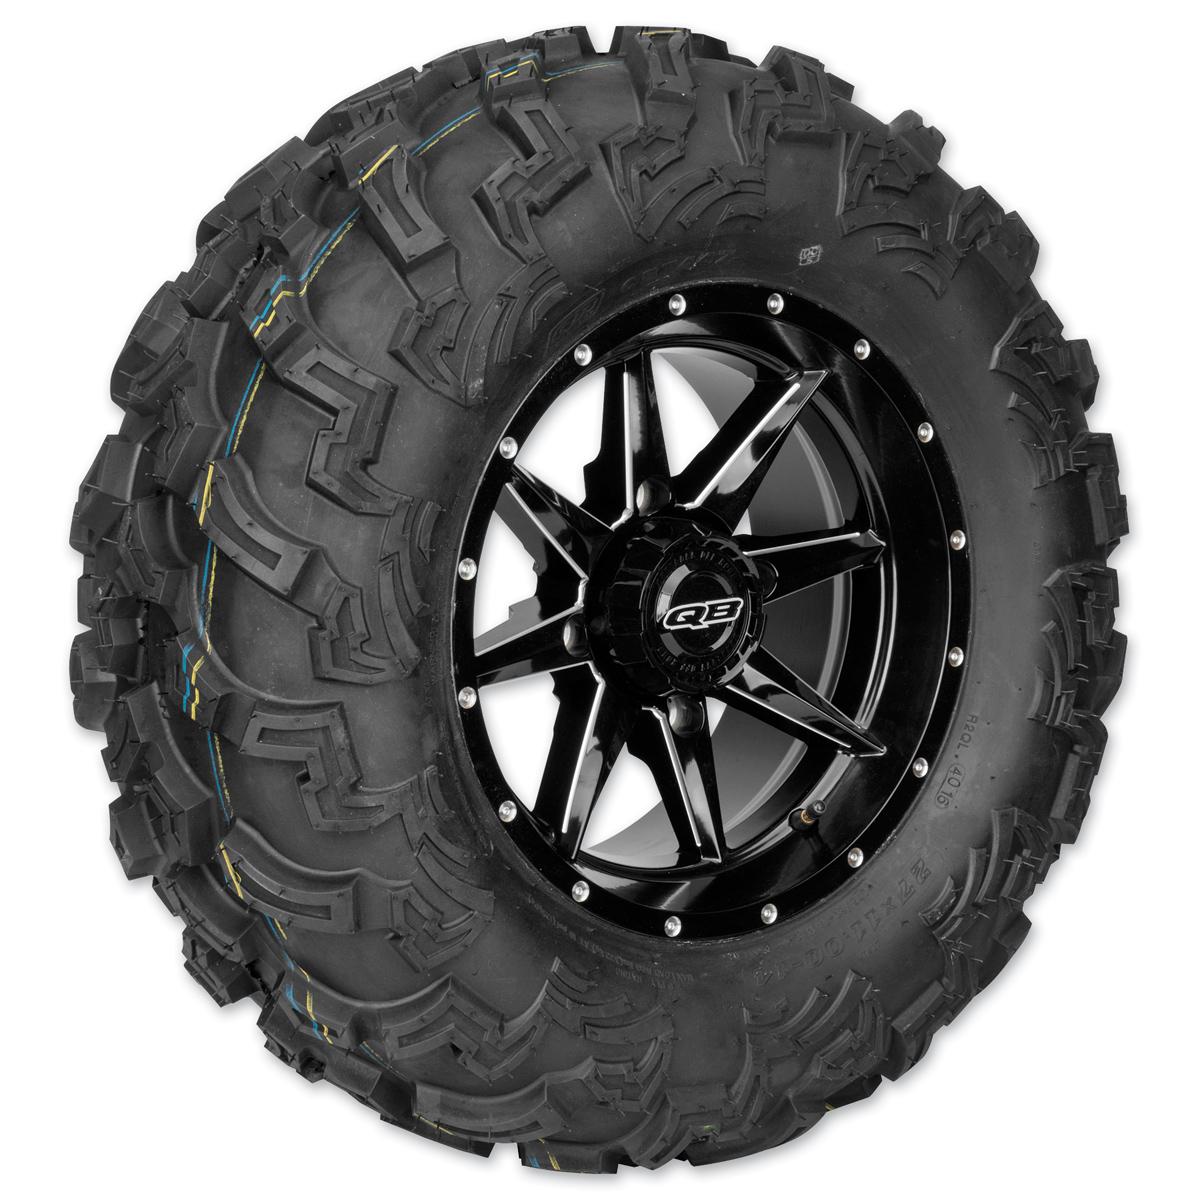 Quadboss QBT447 27X11-14 6-Ply Rear Tire